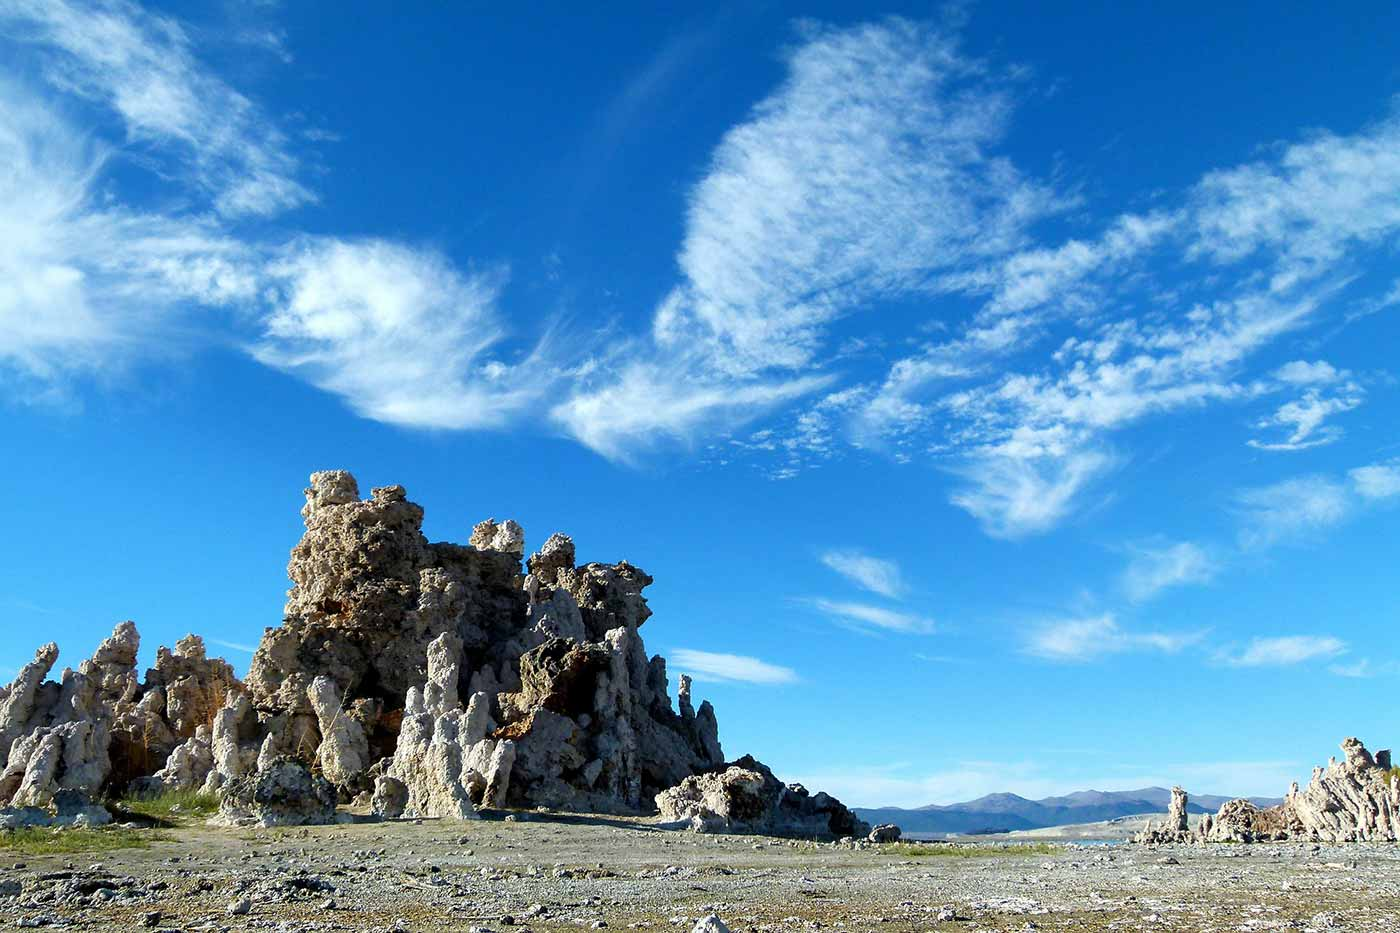 Clouds over a desert landscape